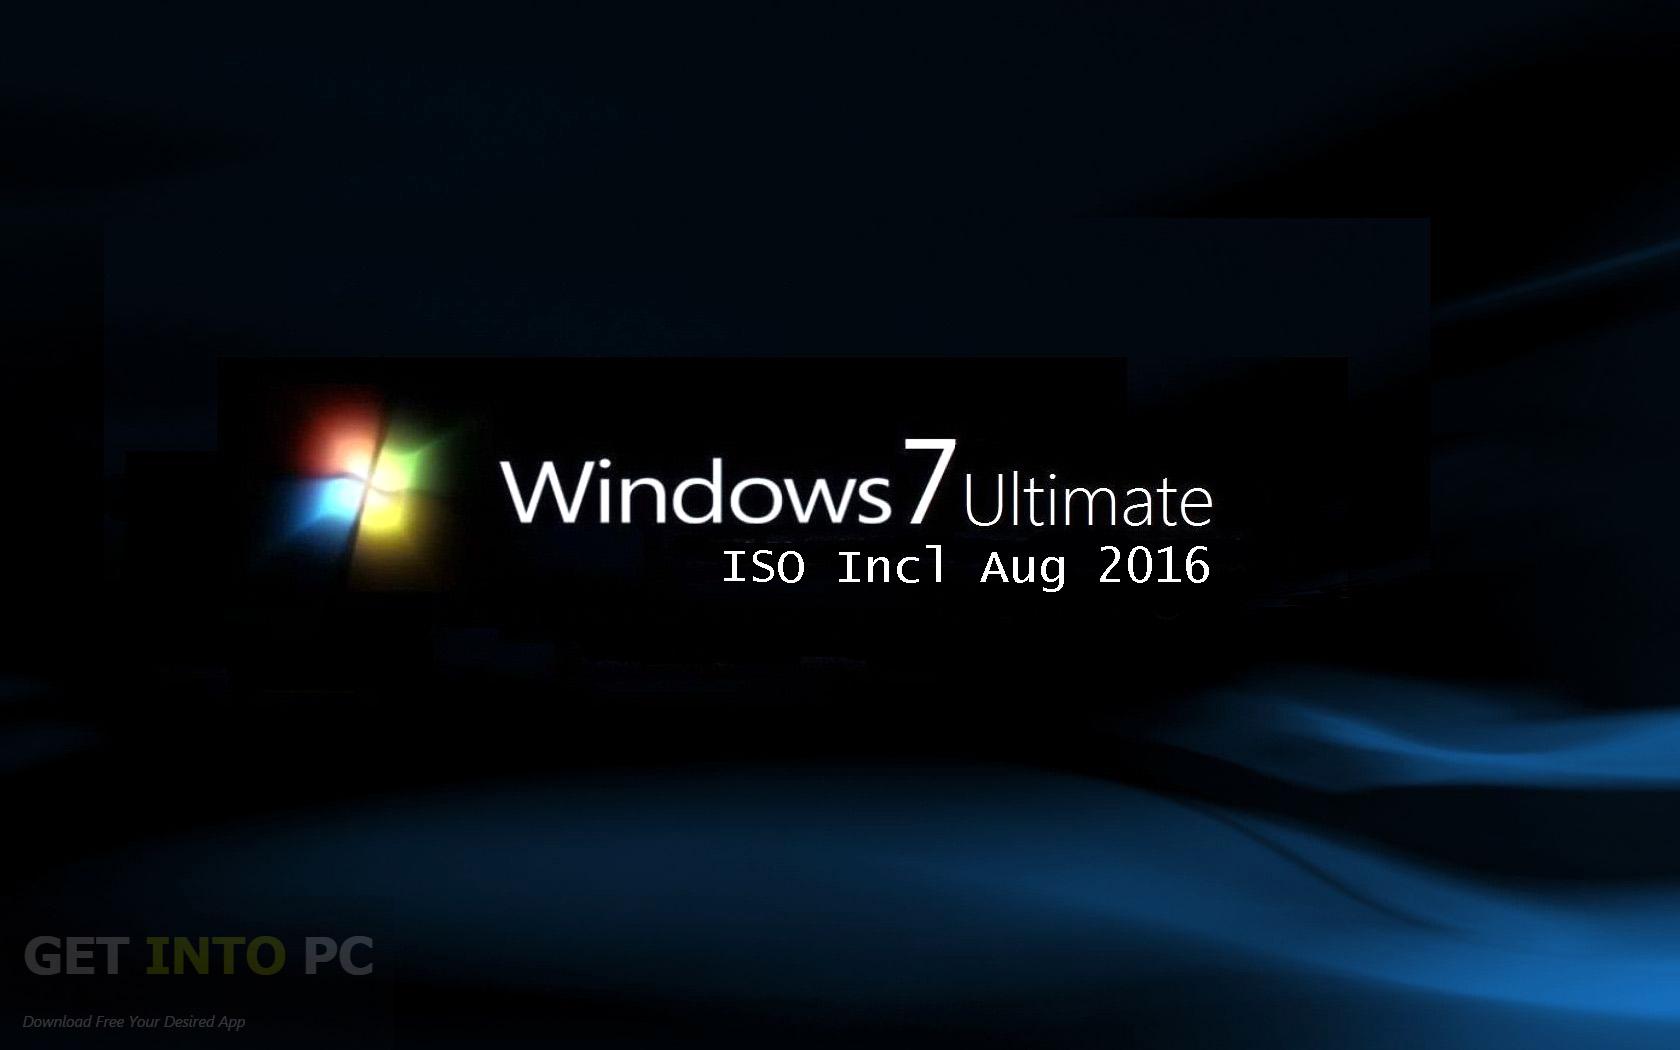 download windows updates manually windows 7